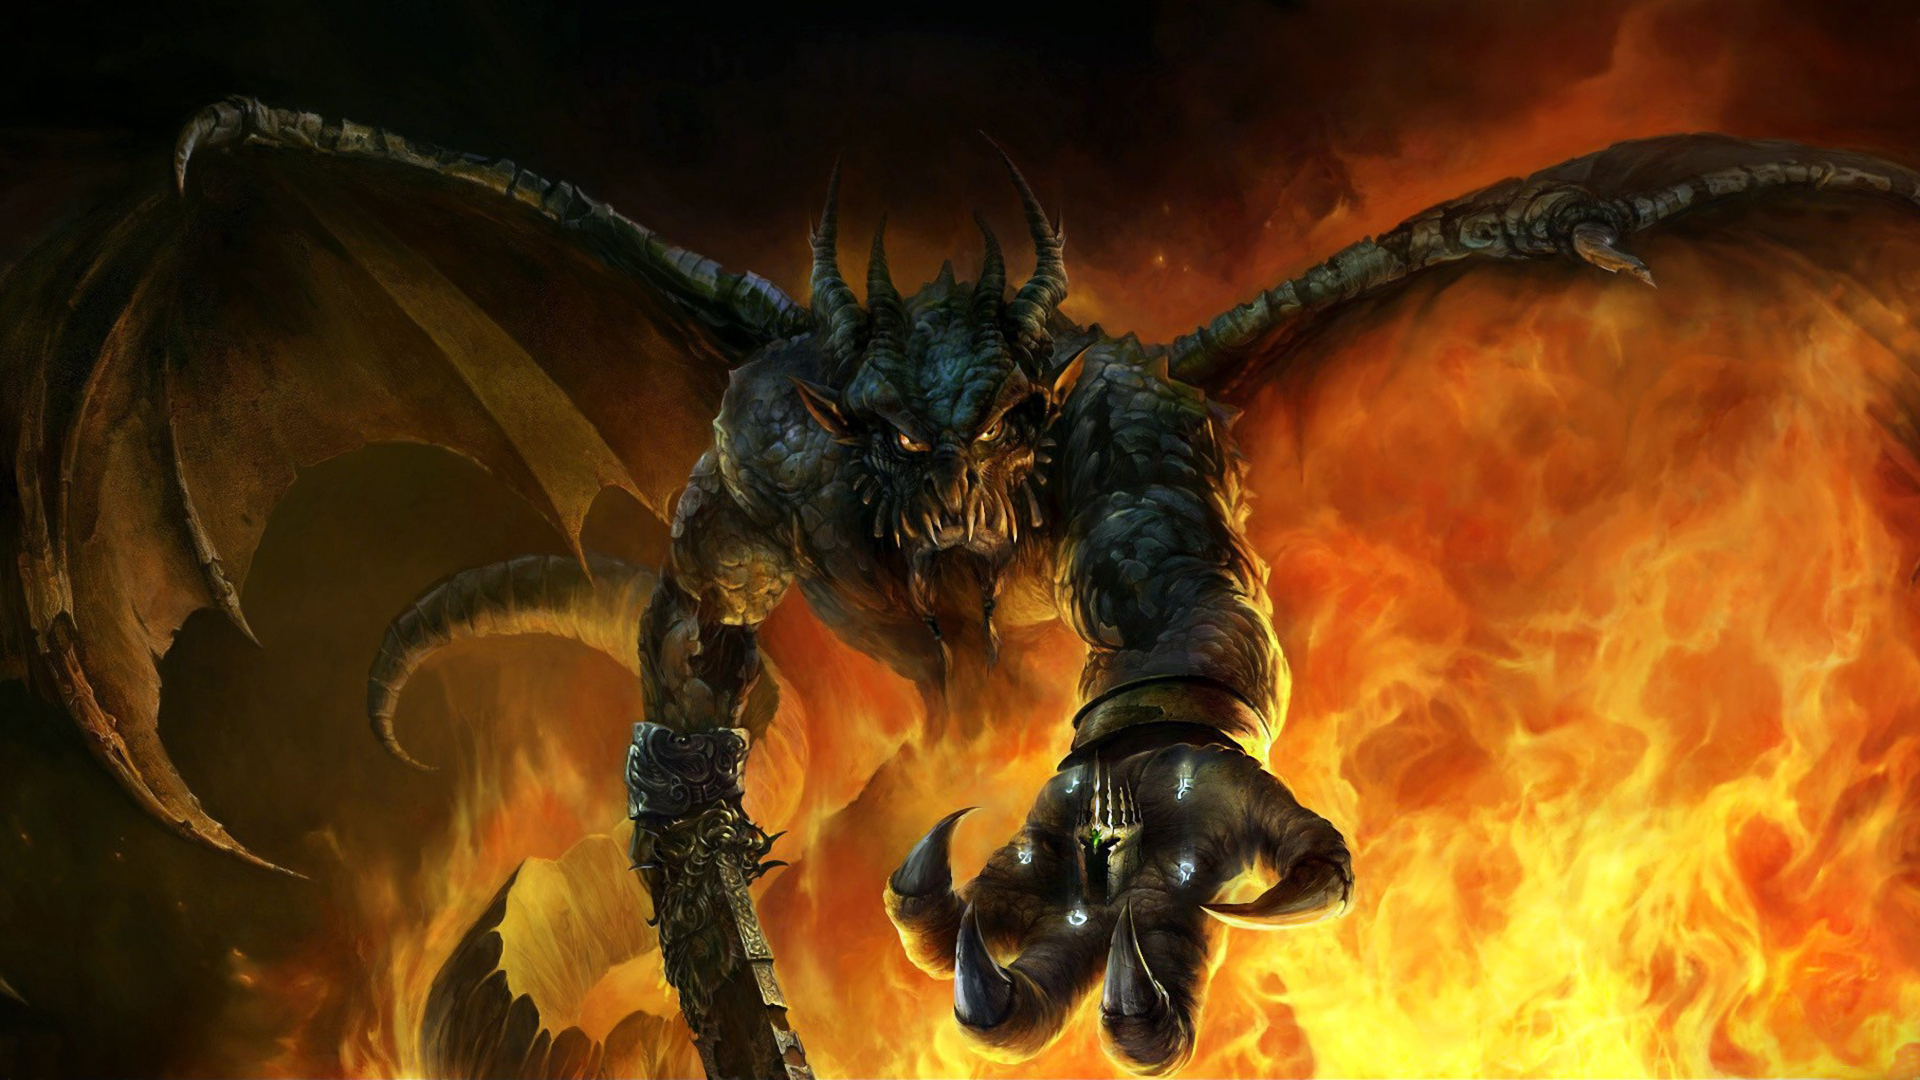 Fantasy   Demon Wallpaper 1920x1080